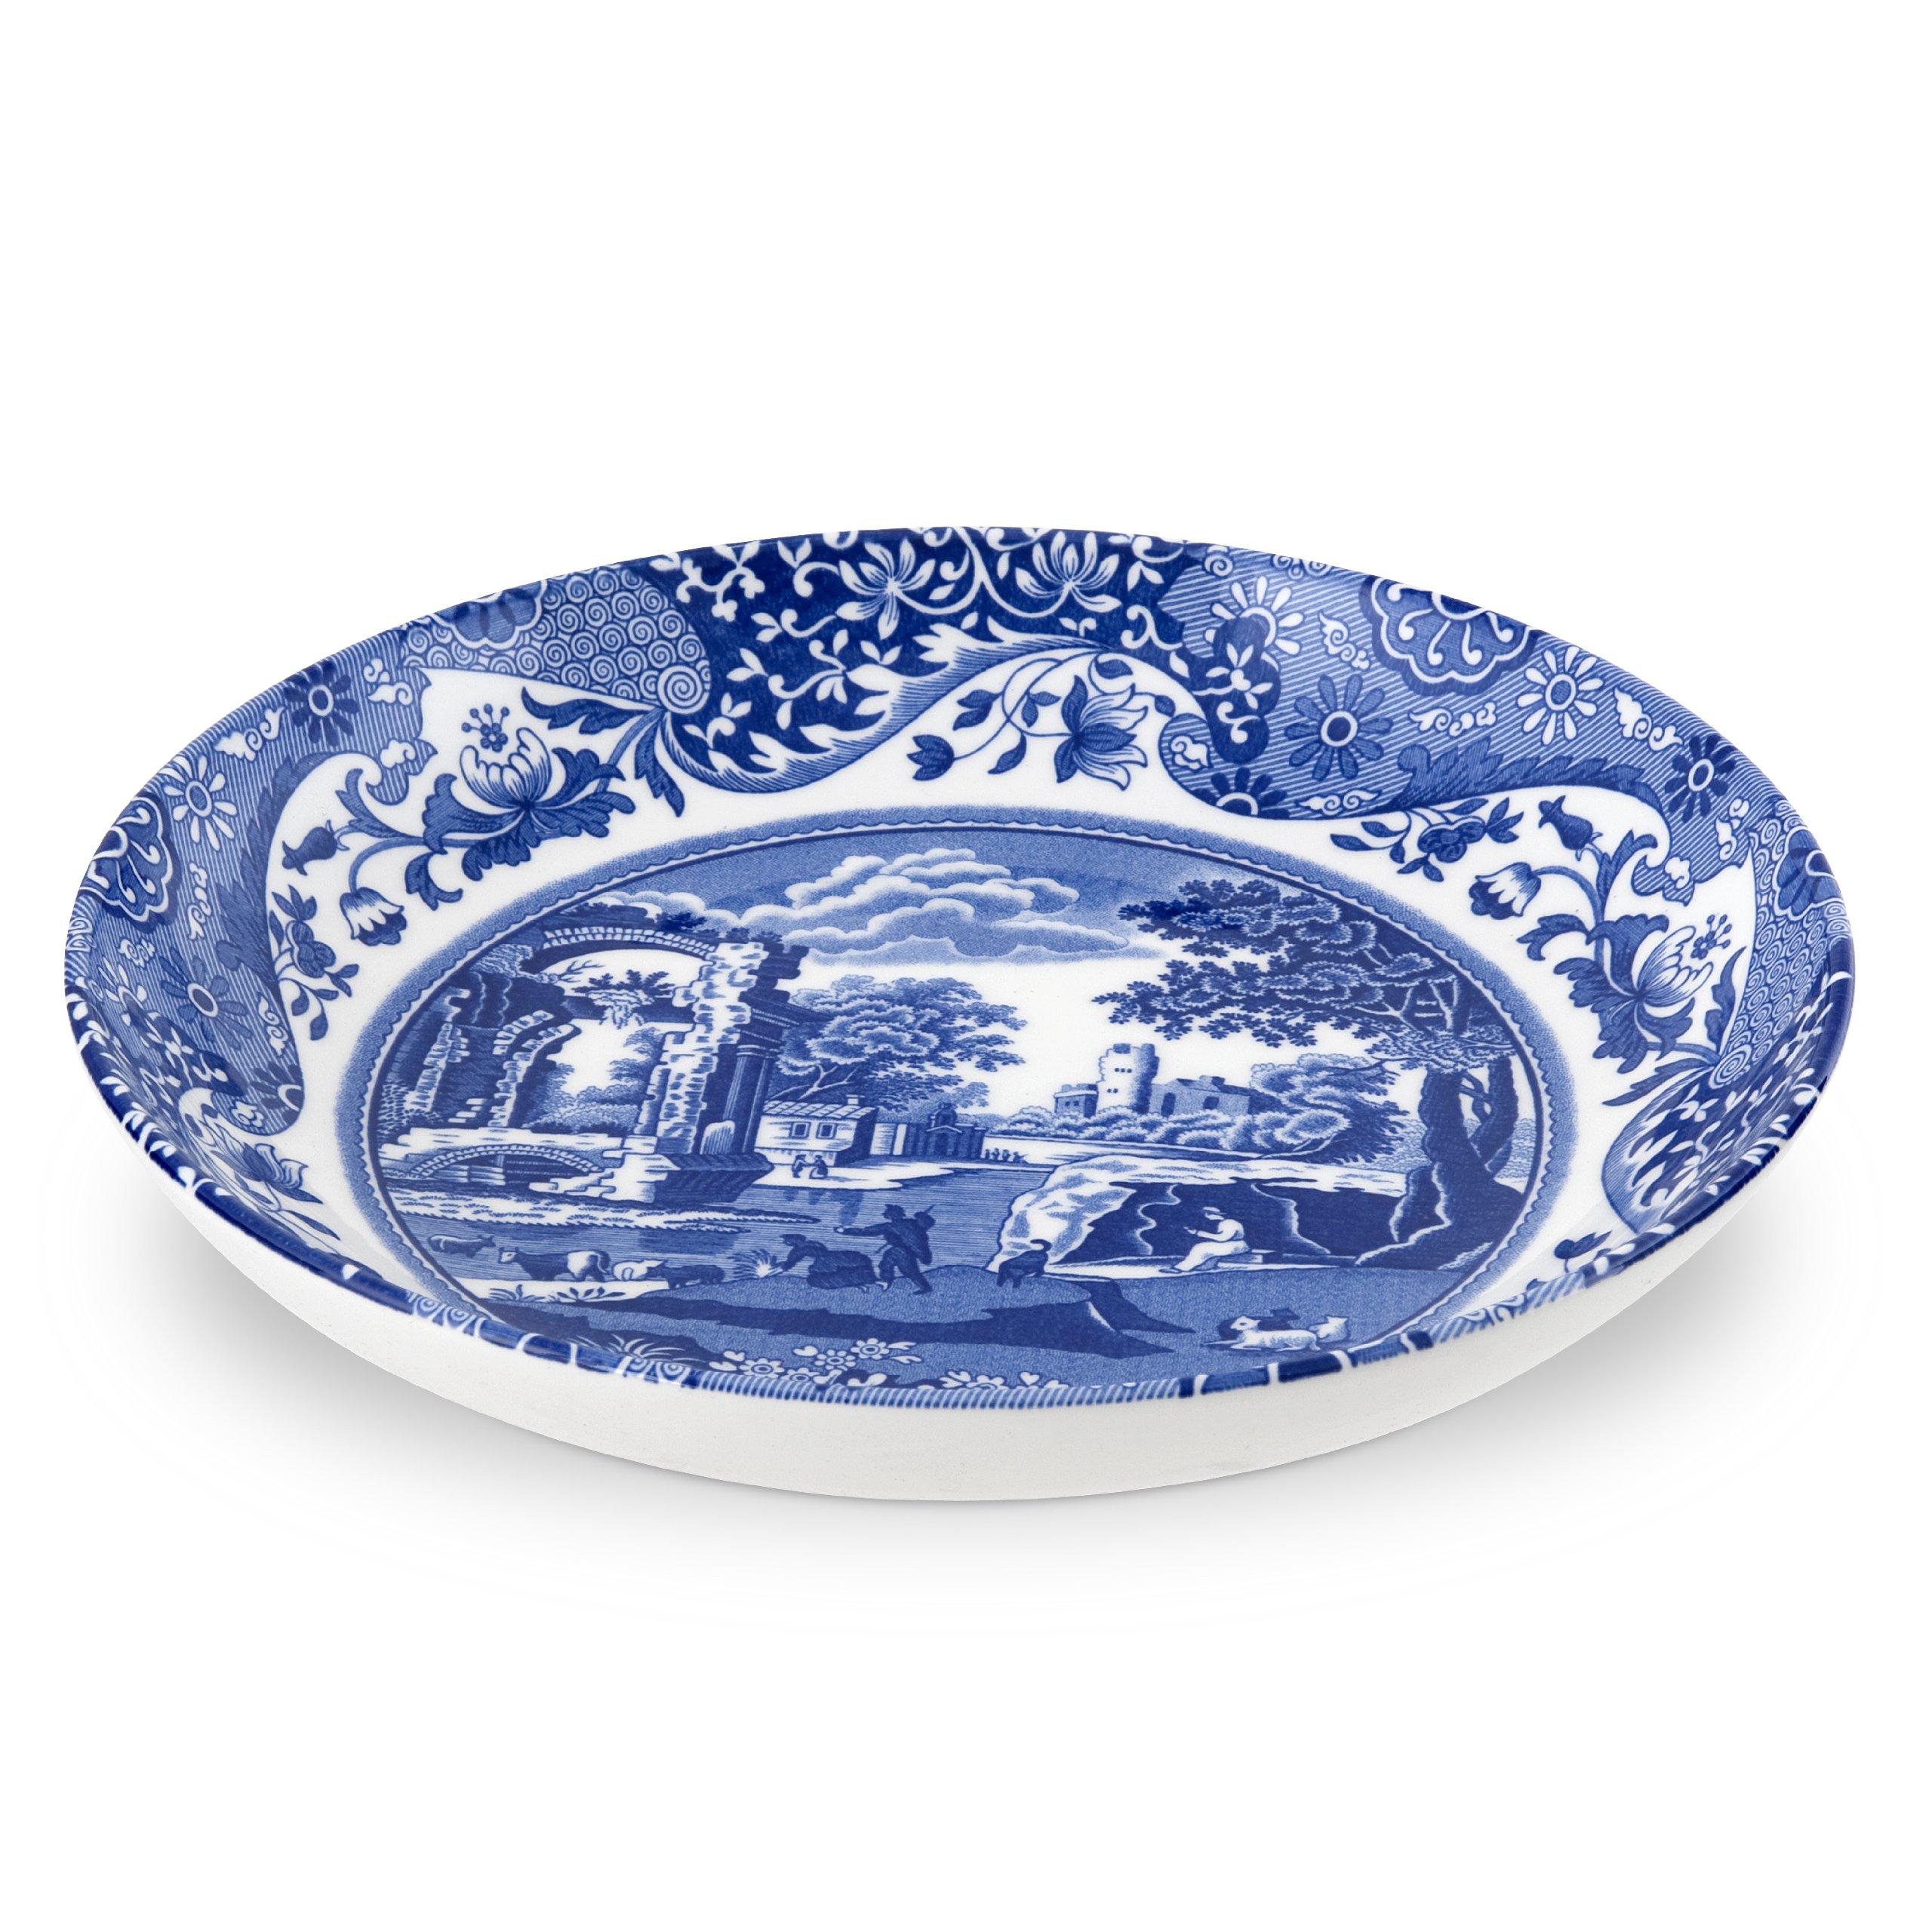 Spode 749151490451 Italian Pasta Bowl, Set of 4, Blue, White, 9'' Pasta Bowl